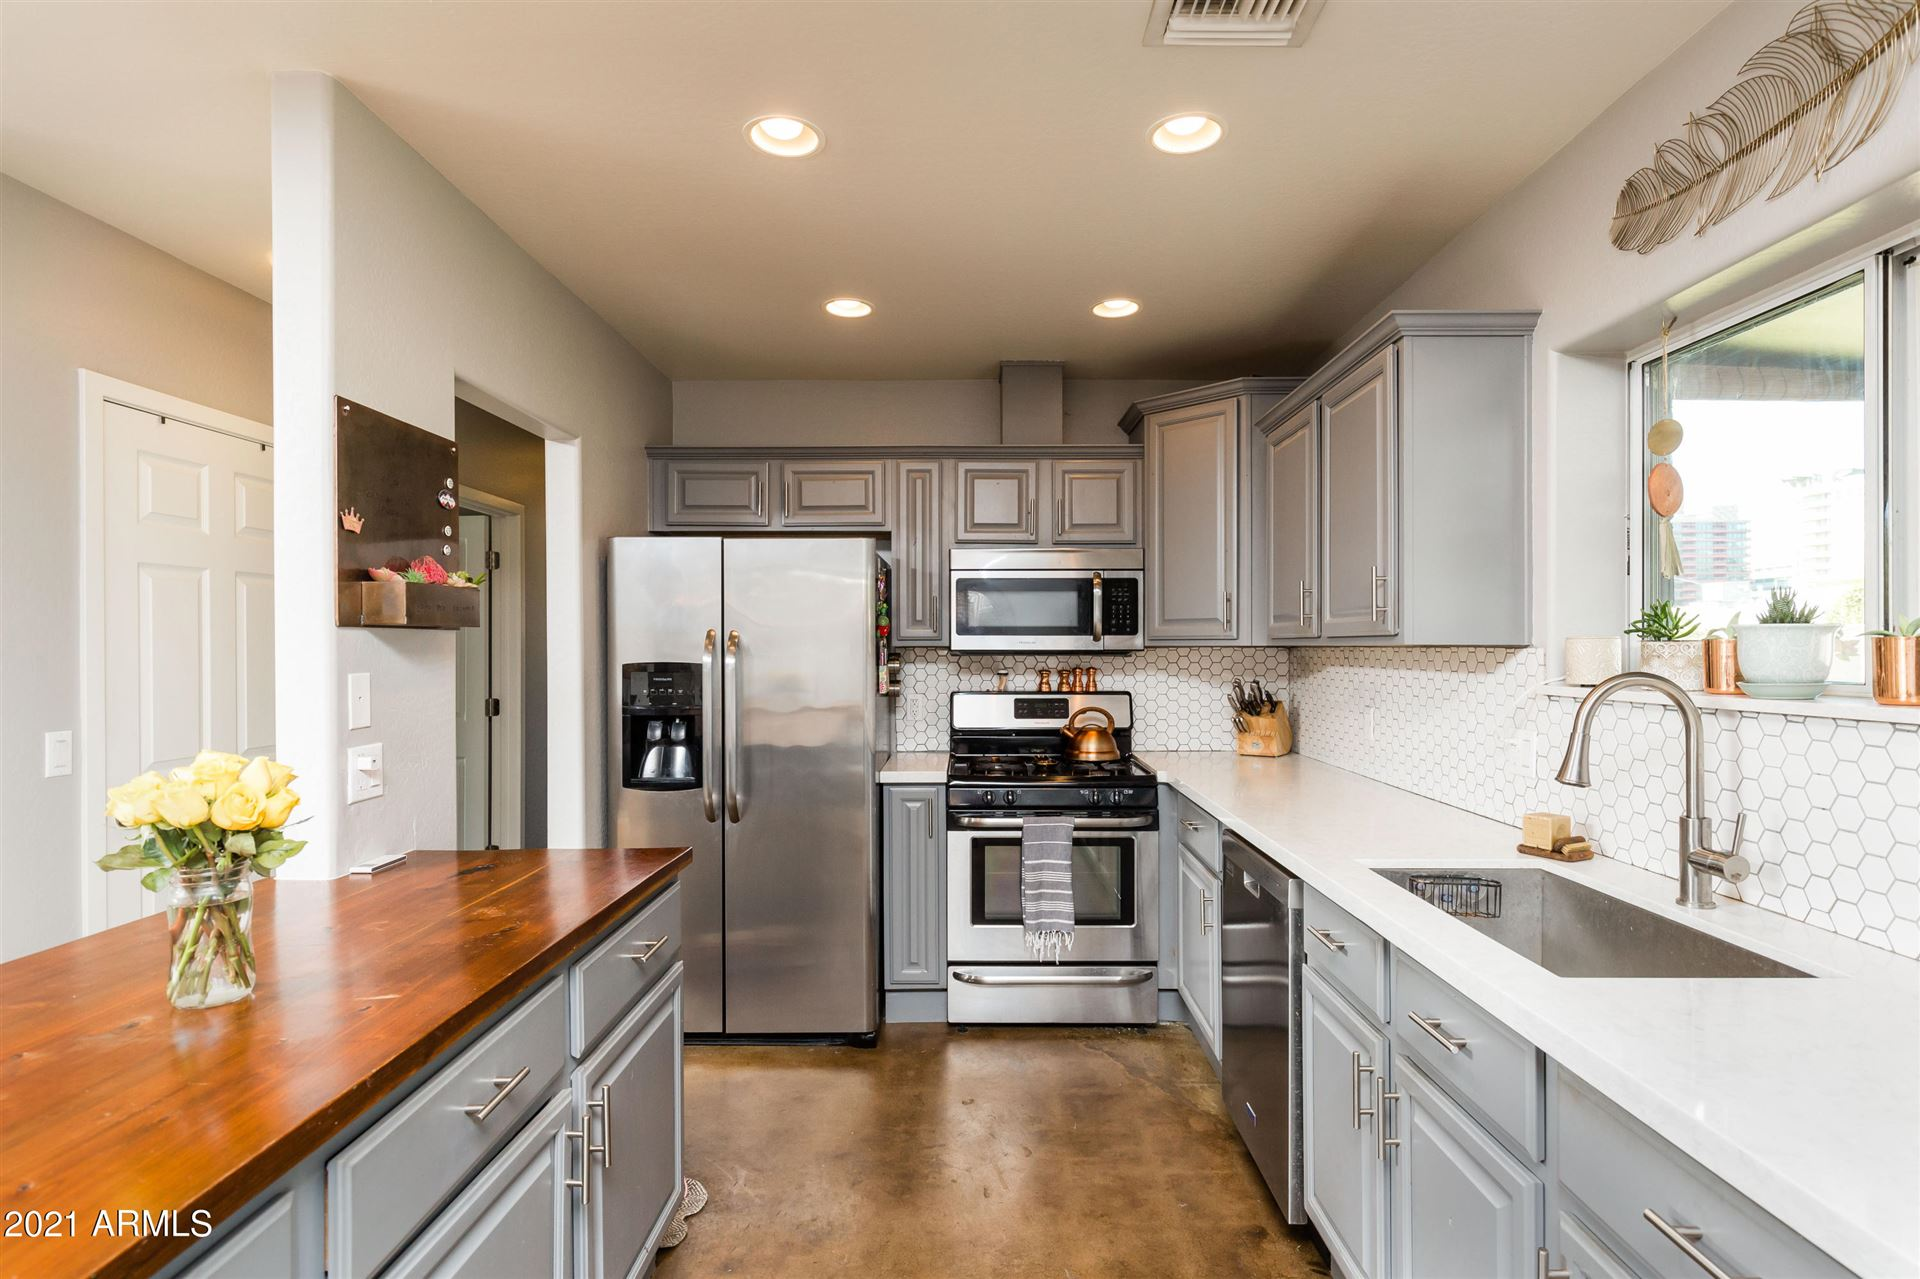 Photo of 2520 E HIGHLAND Avenue, Phoenix, AZ 85016 (MLS # 6201759)